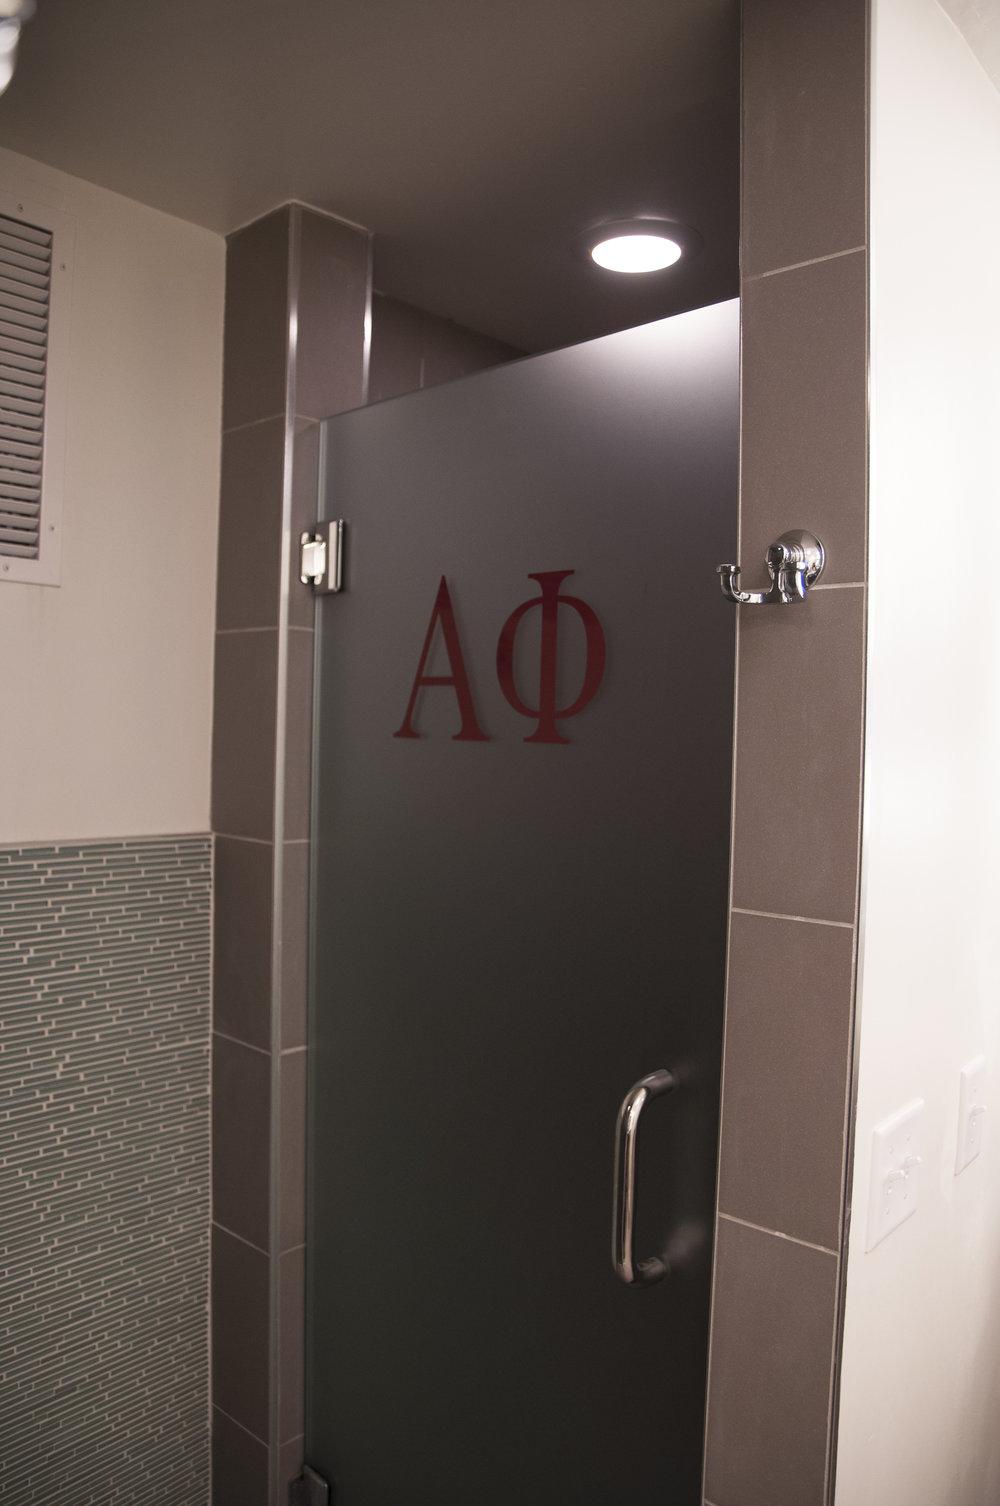 Interiors_AlphaPhi_Bathroom-19.jpg